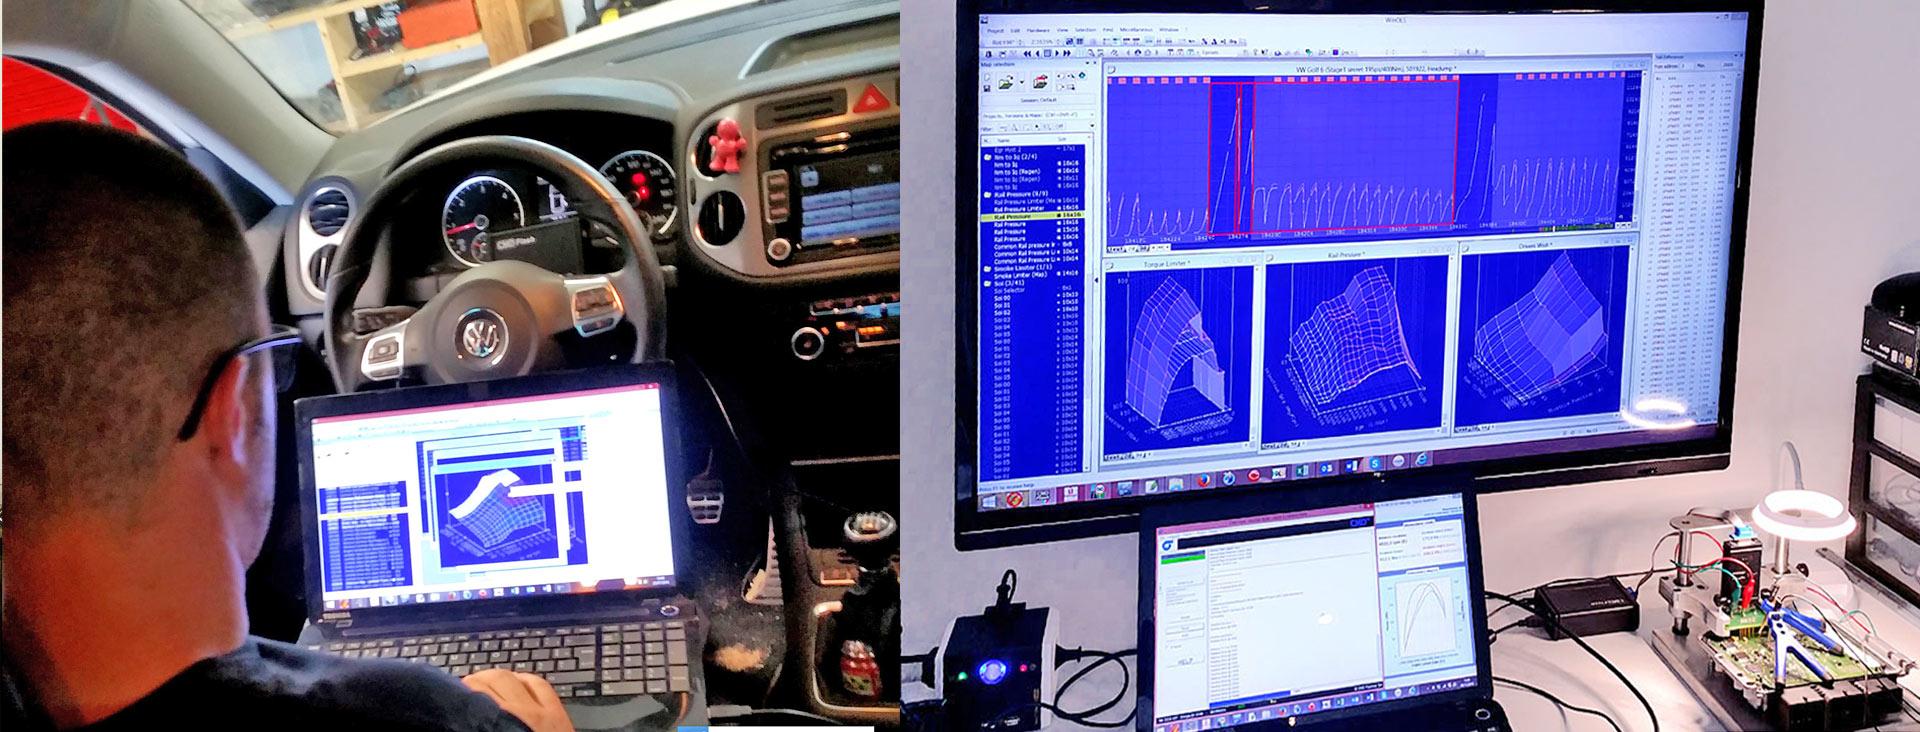 Reprogrammation Moteur Ajaccio et Reprogrammation voiture Bastia